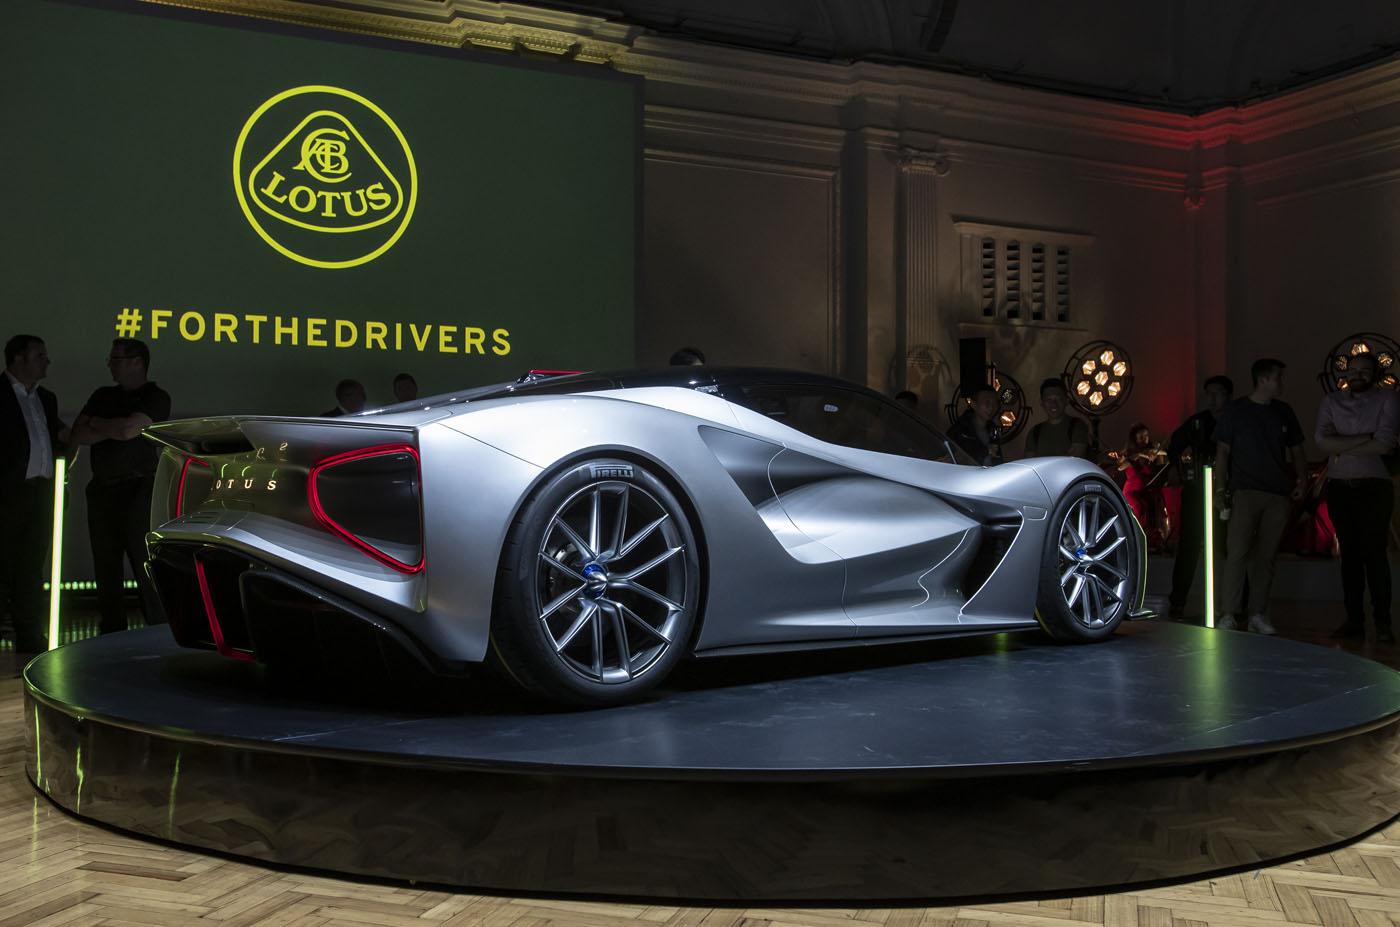 Lotus Evija - premiera super-samochodu